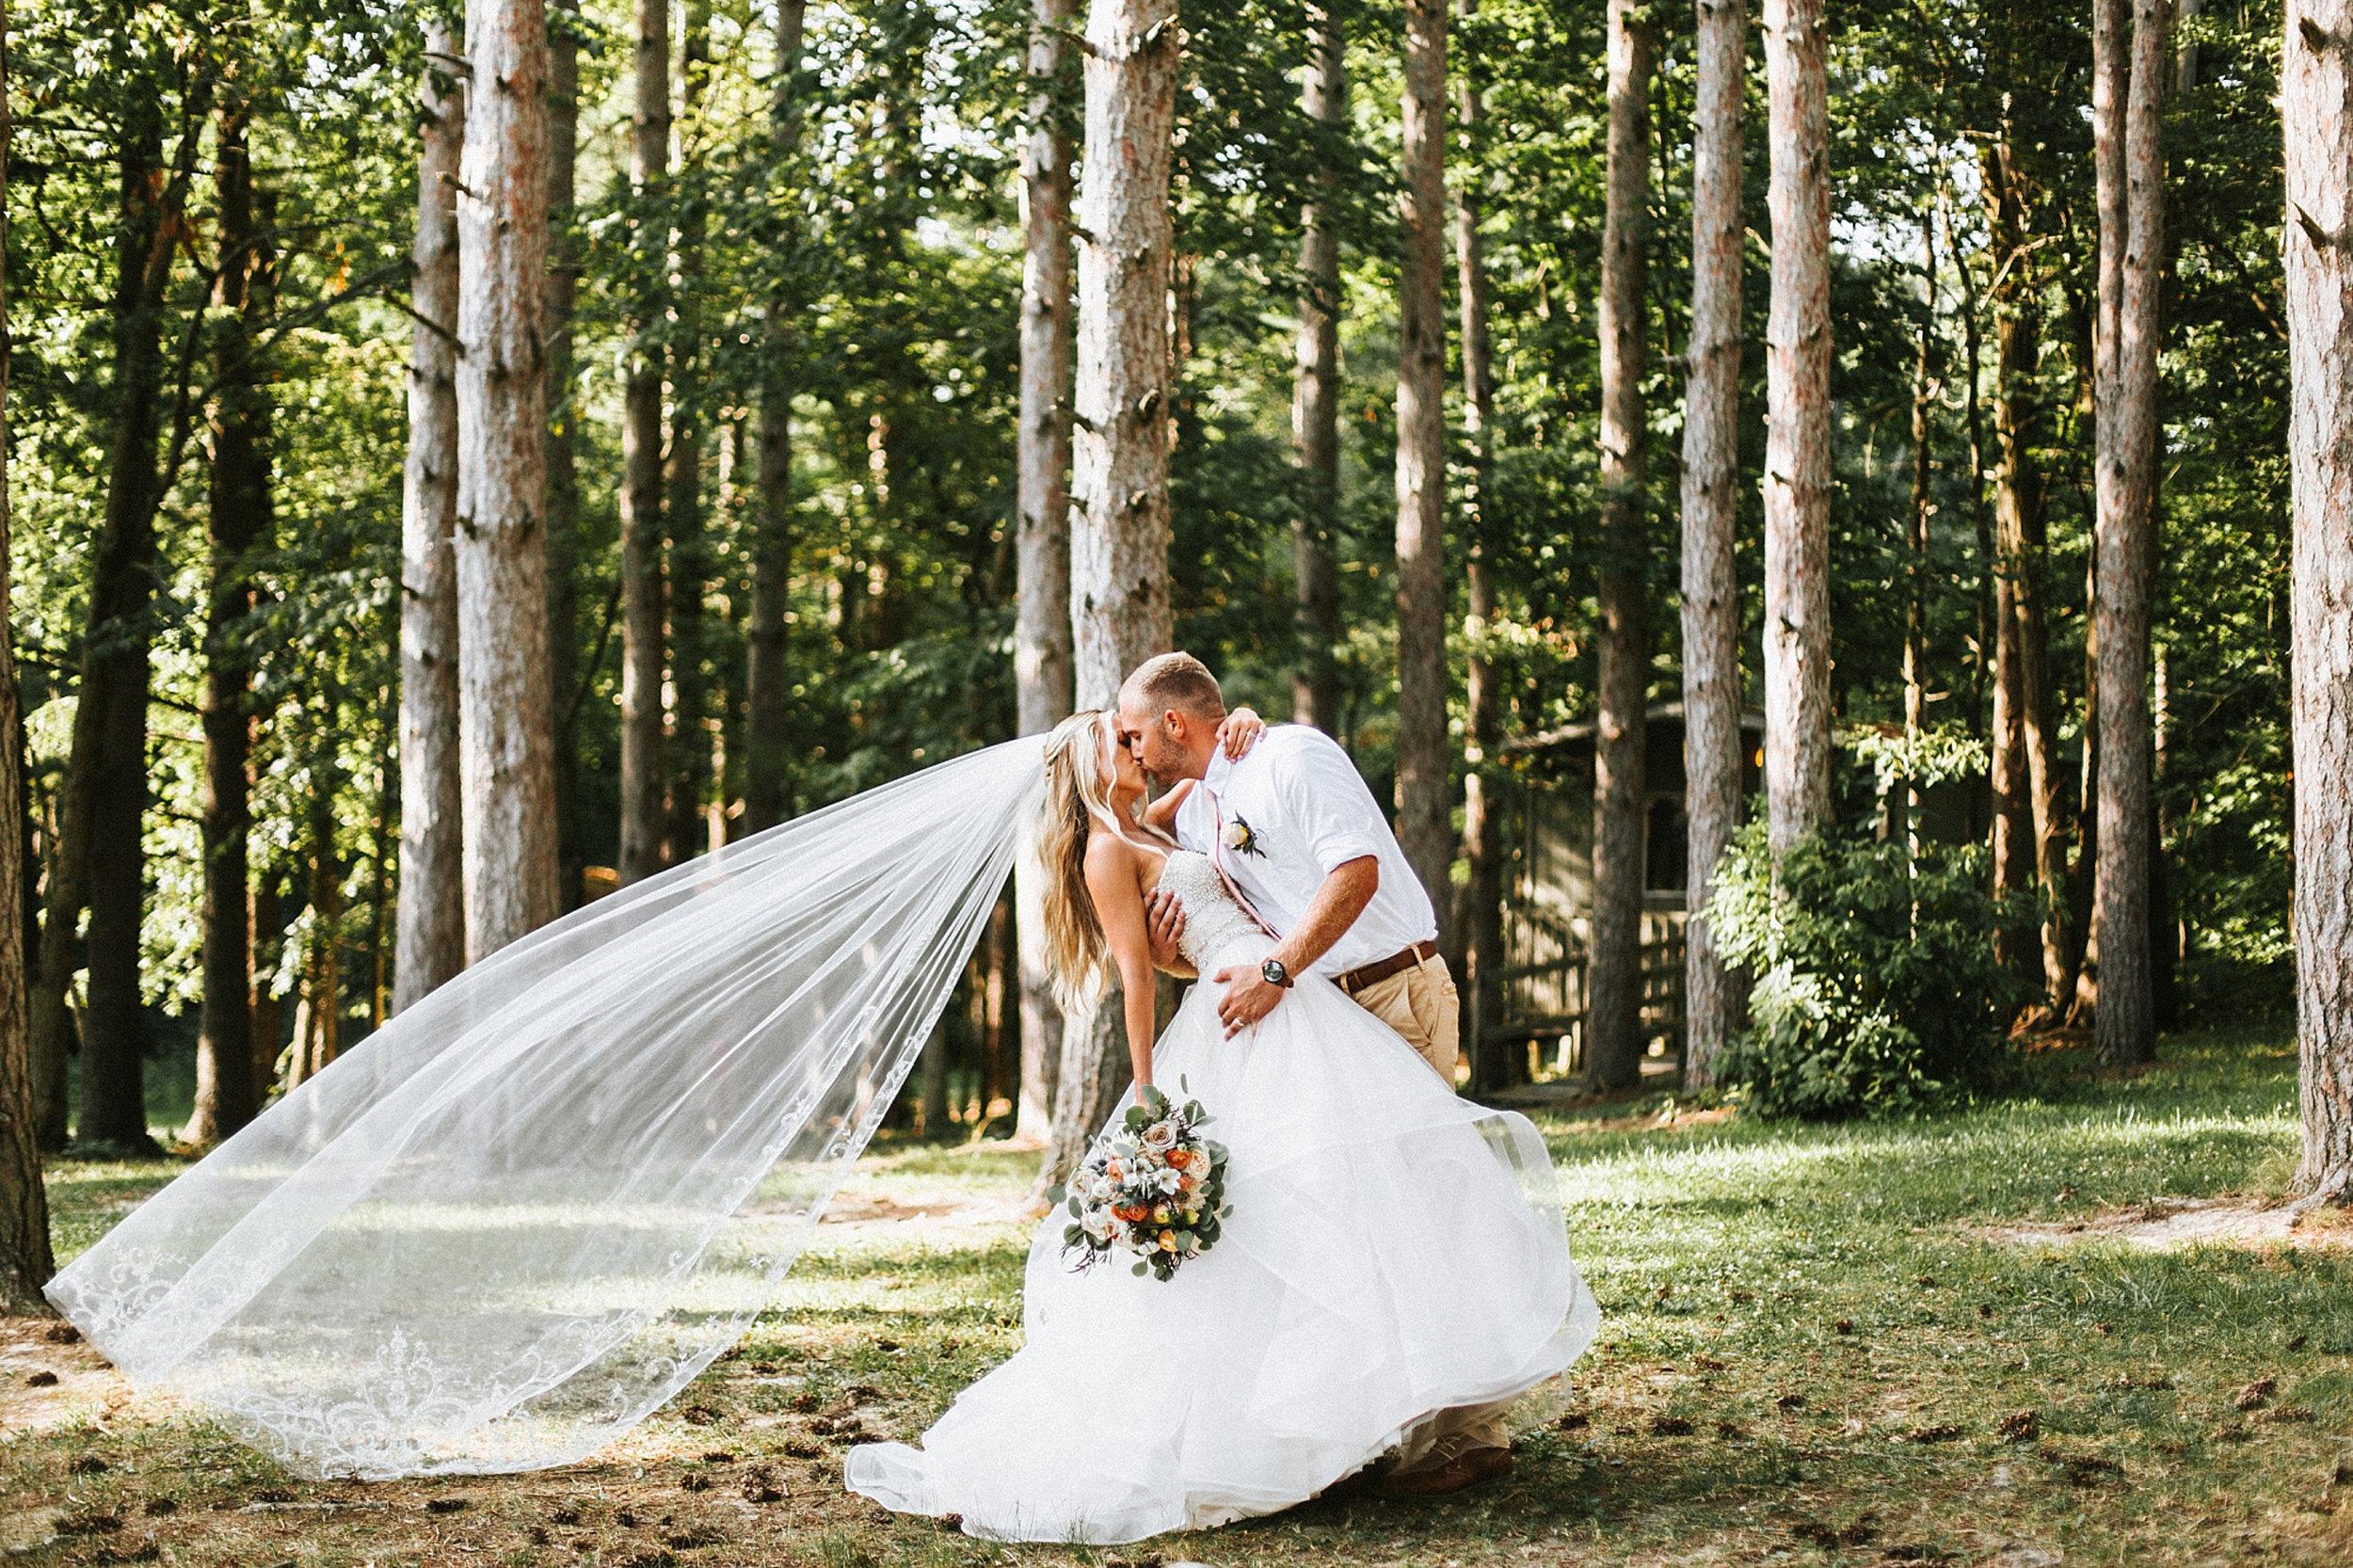 Brooke Townsend Photography - Cincinnati Wedding Photographer (111 of 153).jpg